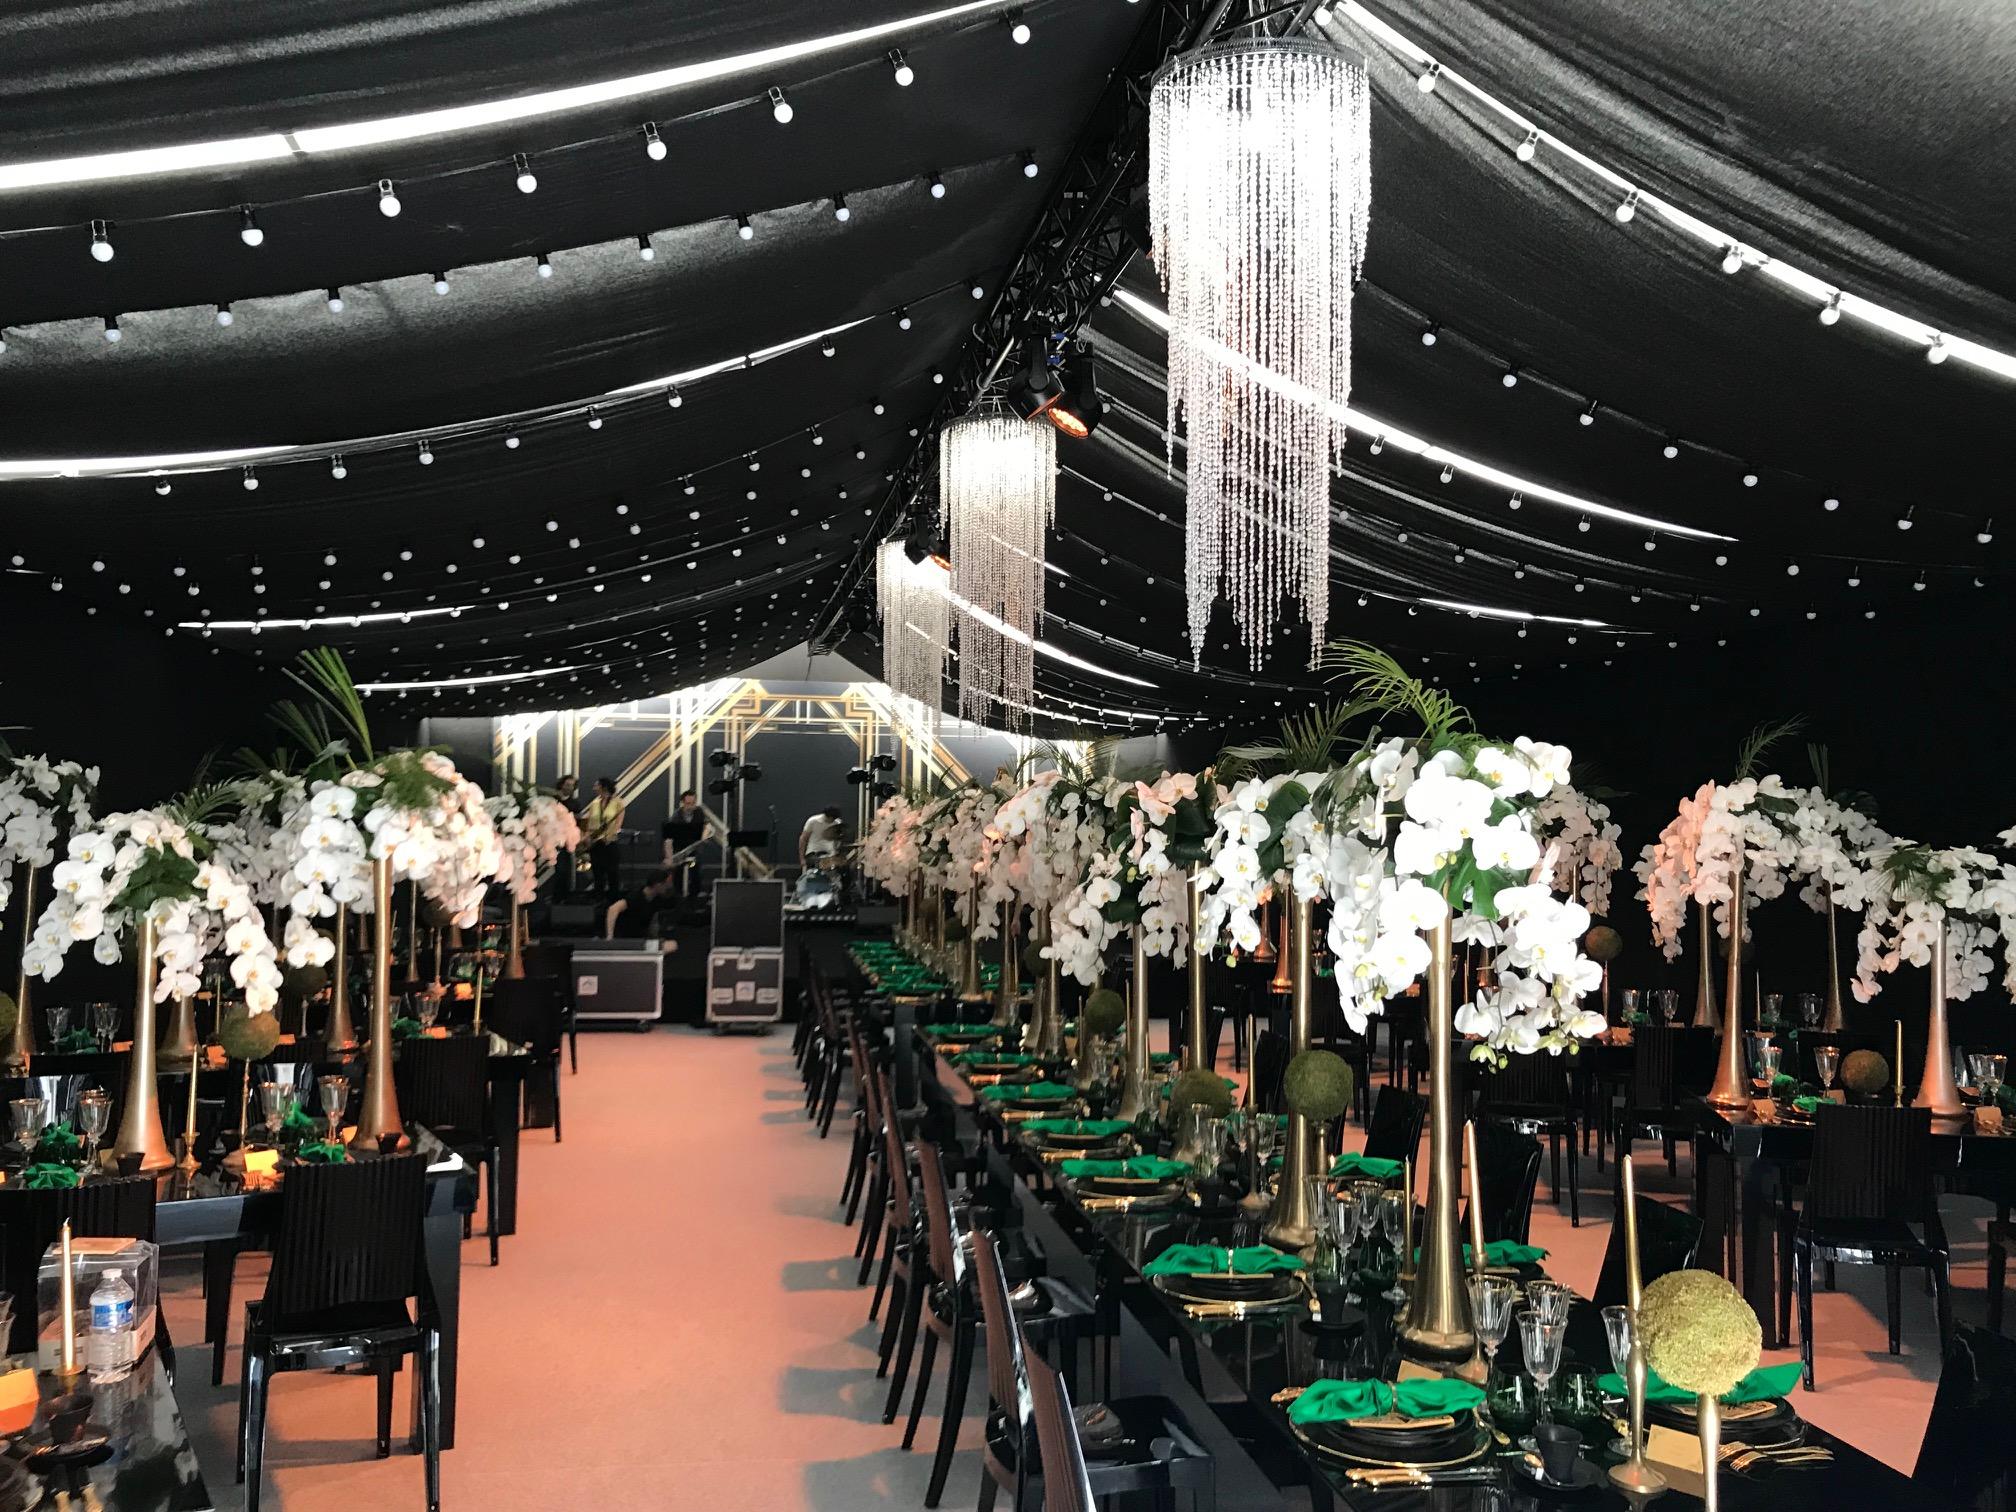 aucop-event-abbaye de valasse-evenement-son-eclairage-deco-wissous-audiovisuel-carros-we world experts-ikebana